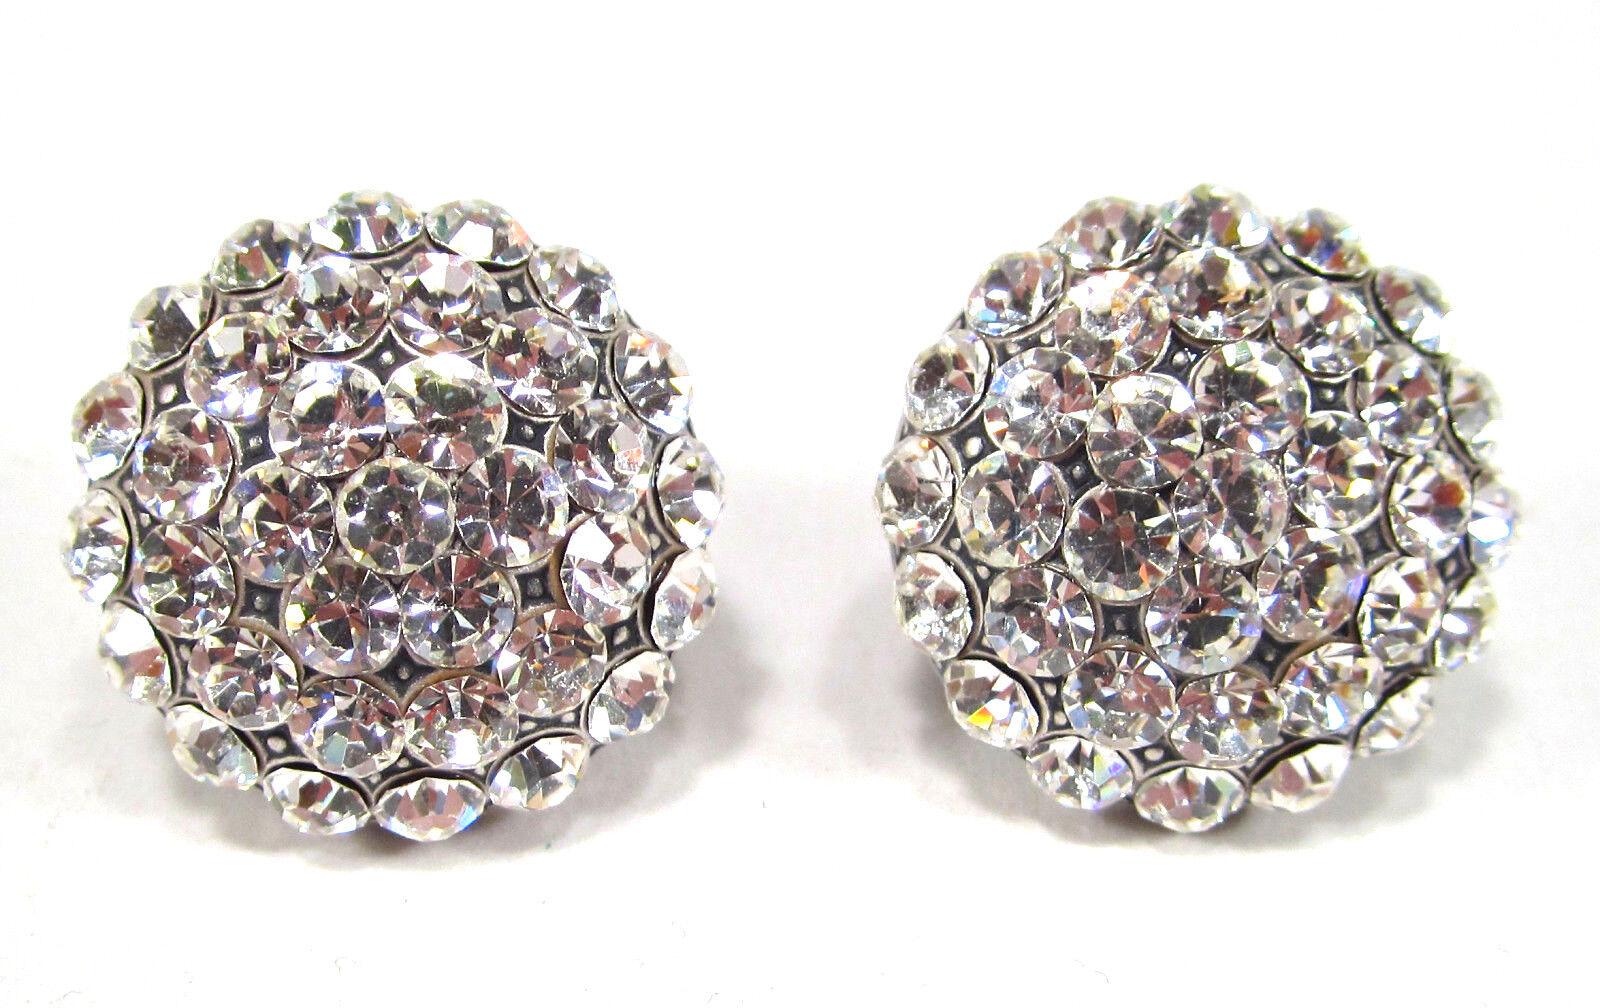 SoHo® große Ohrclips geschliffene Kristalle crystal Halbkugel Strassclips weiss